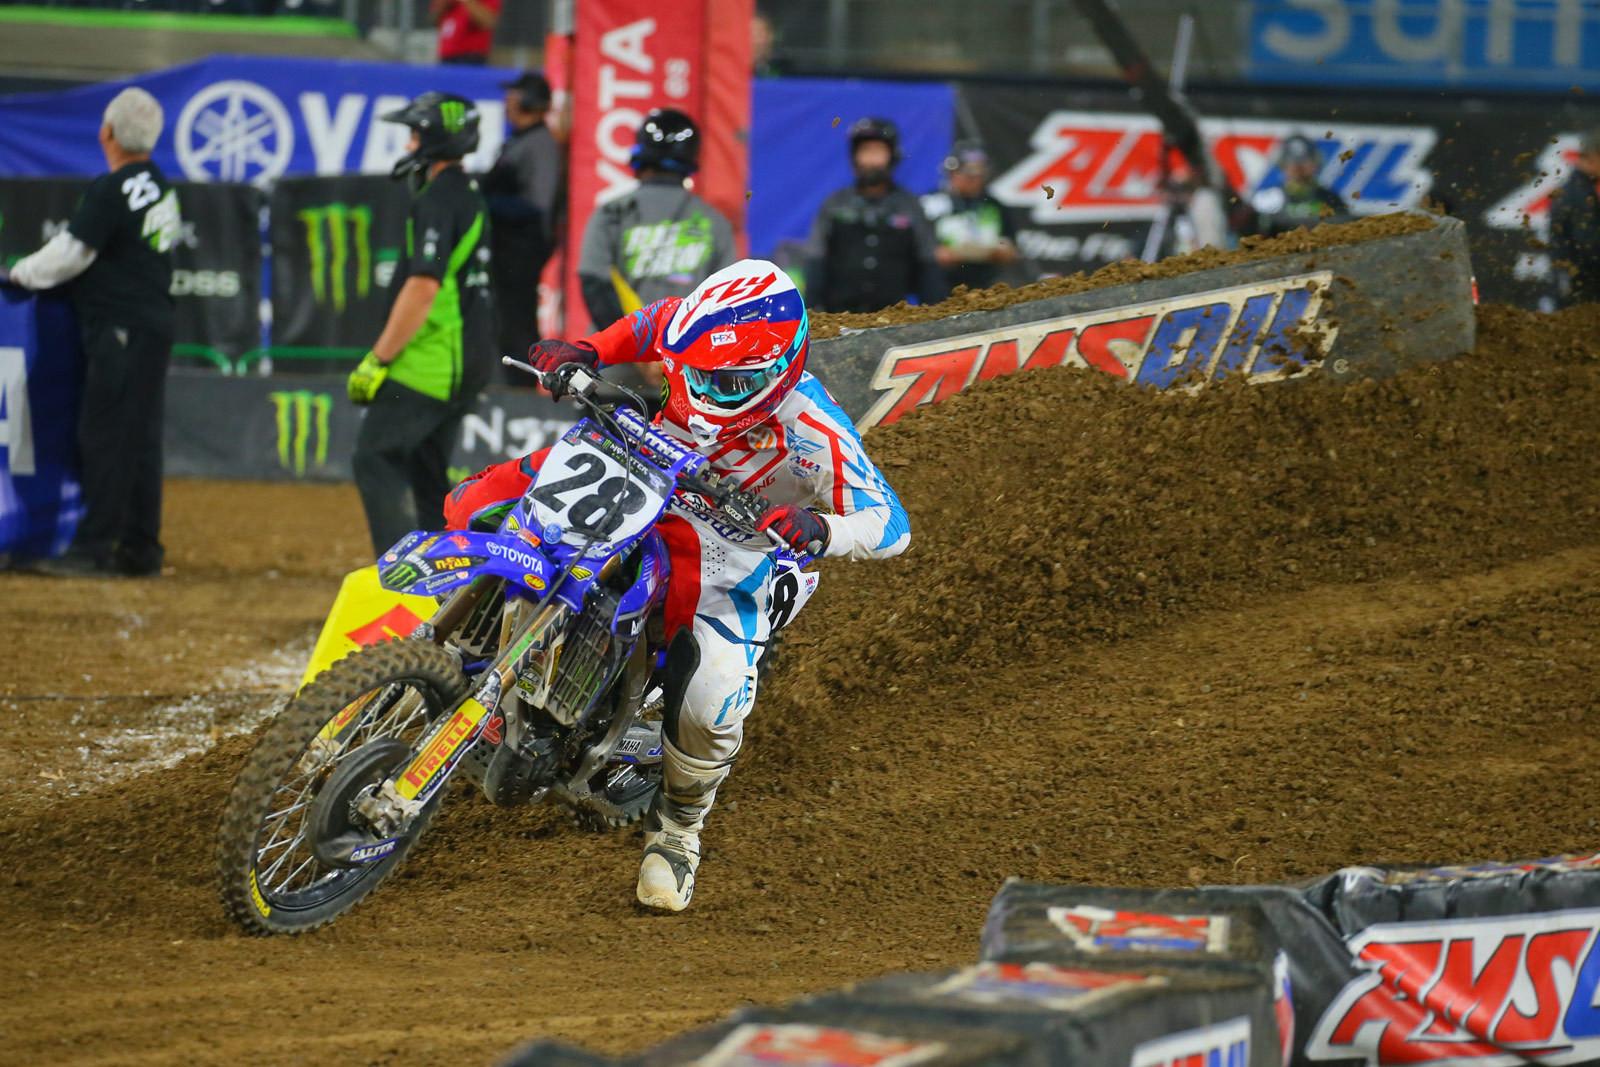 Weston Peick - Photo Blast: San Diego 2 - Motocross Pictures - Vital MX